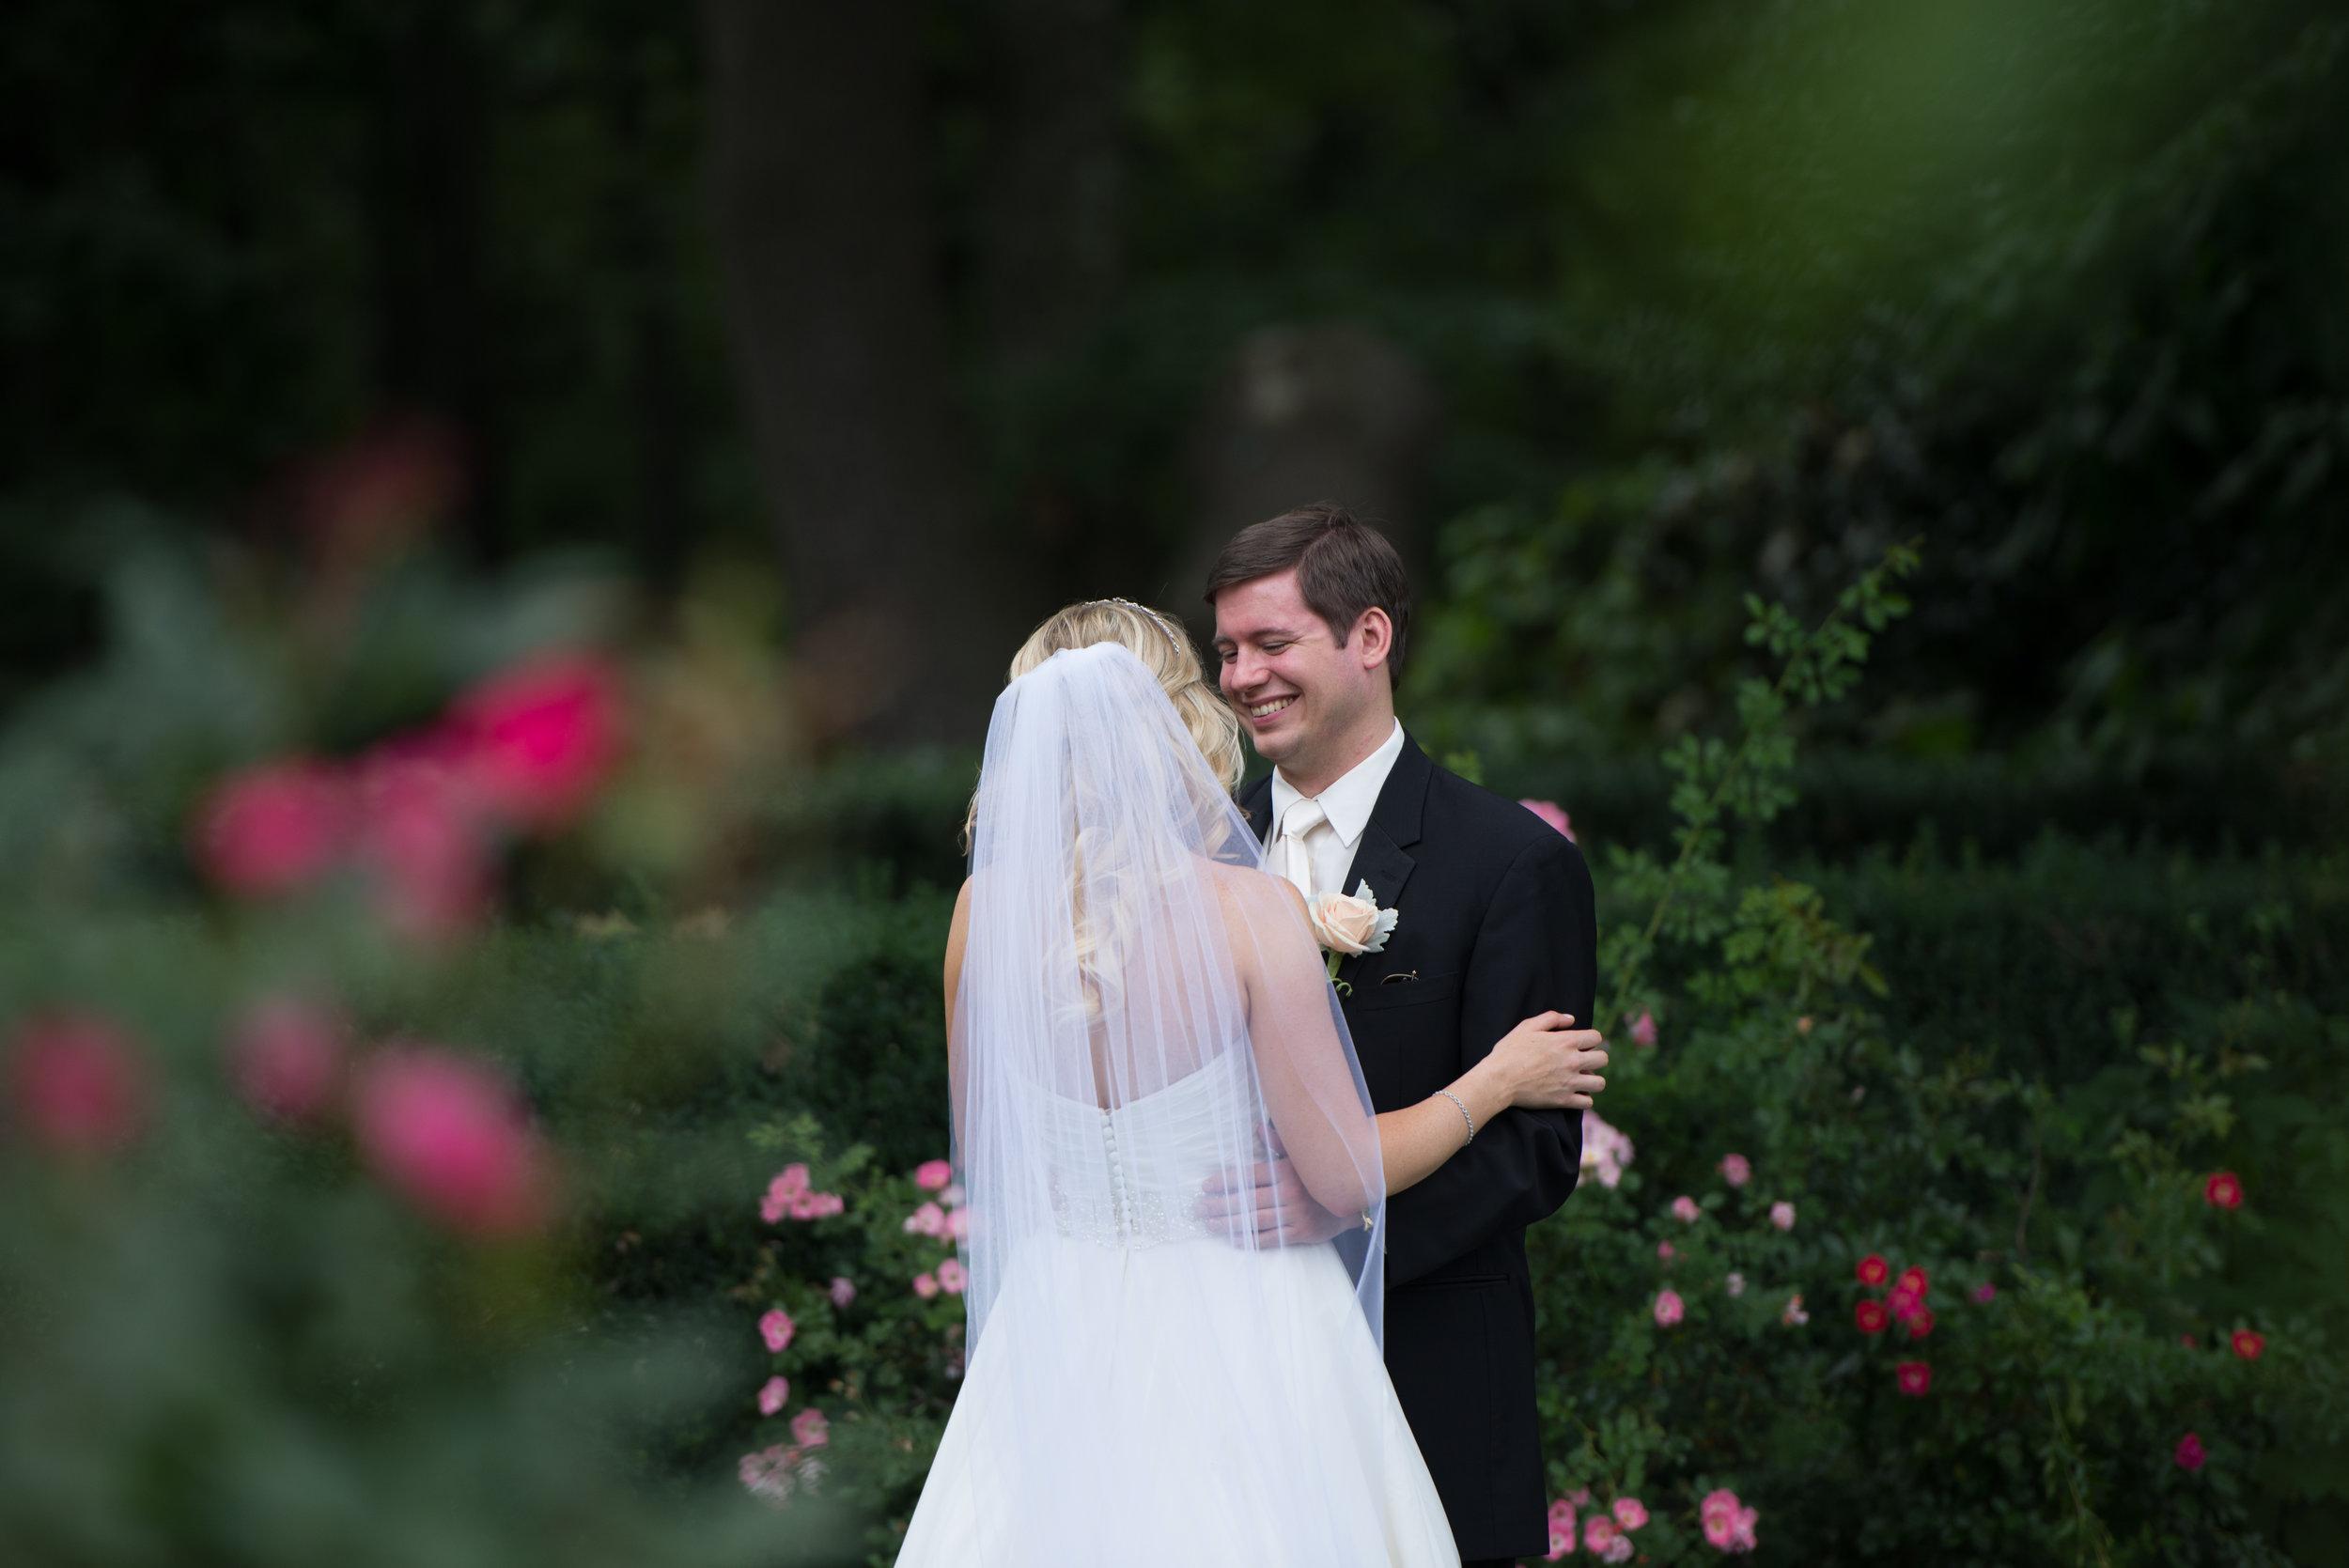 Wedding First Look Photos00945.jpg